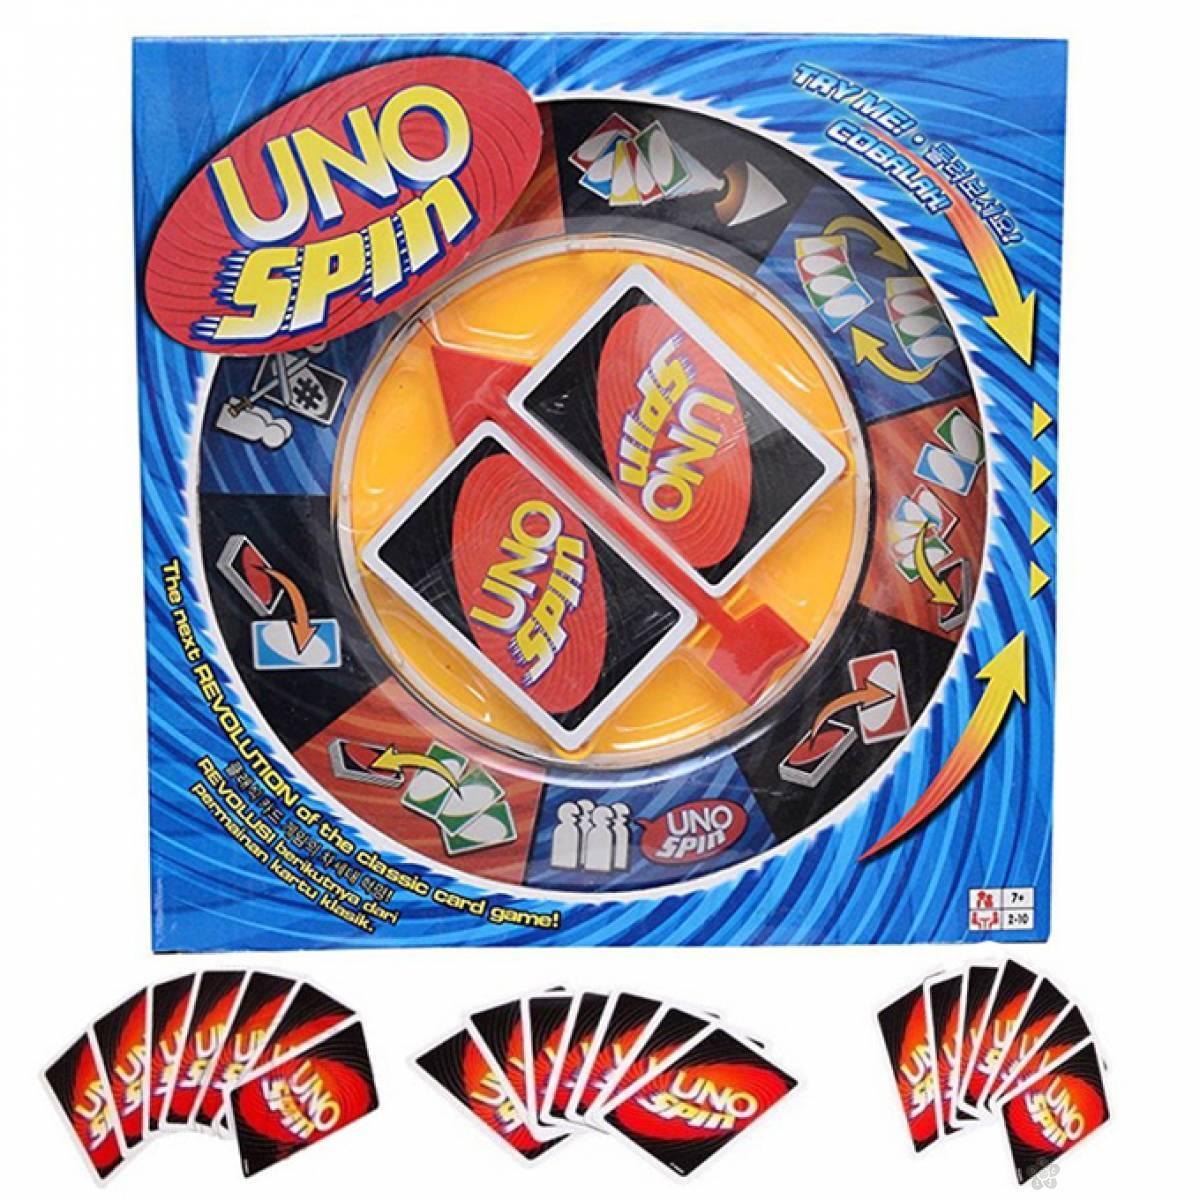 UNO Spin društvena igra